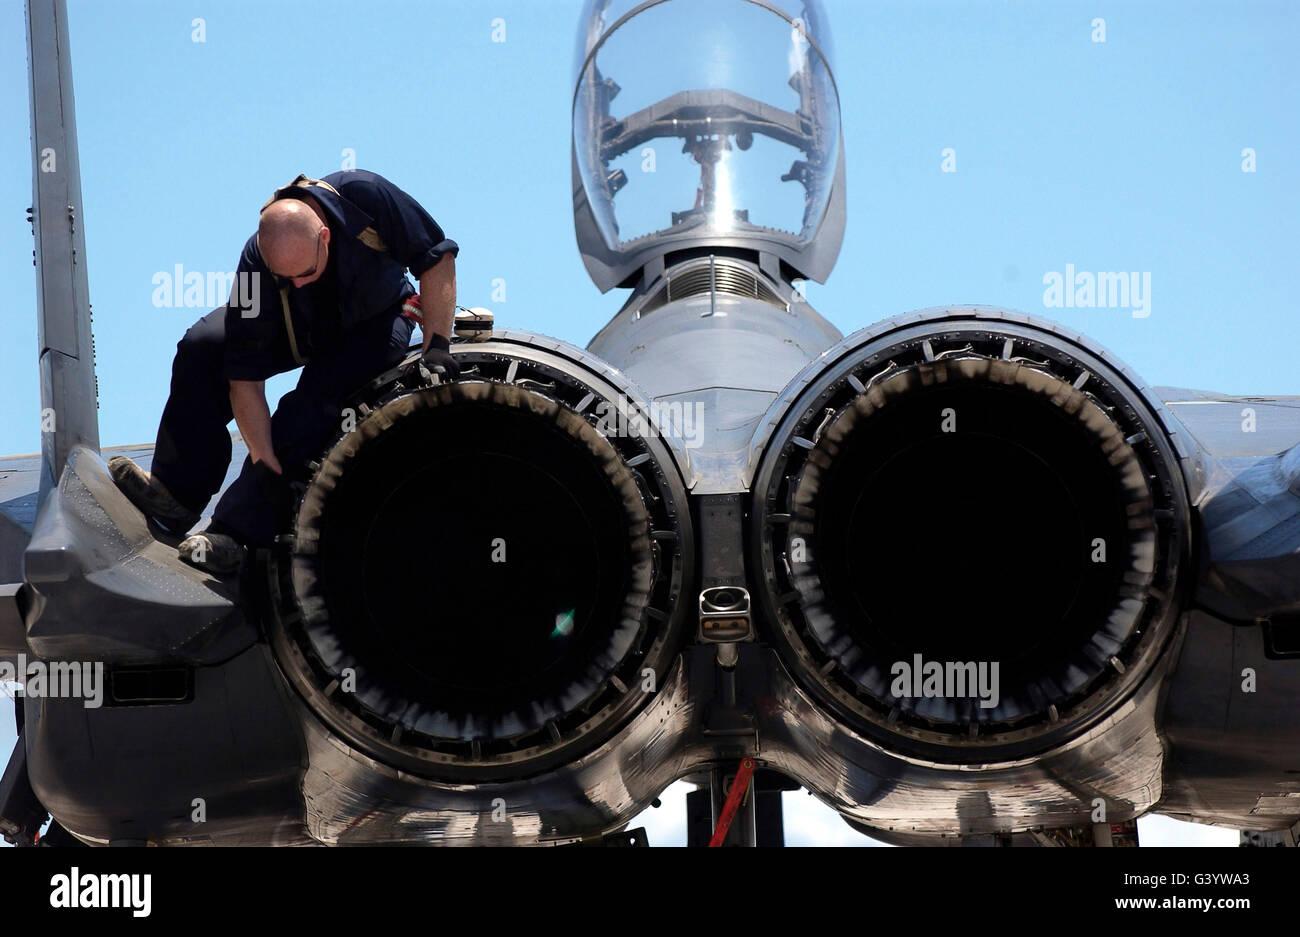 Airman checks an F-15E Strike Eagle for airframe damage - Stock Image